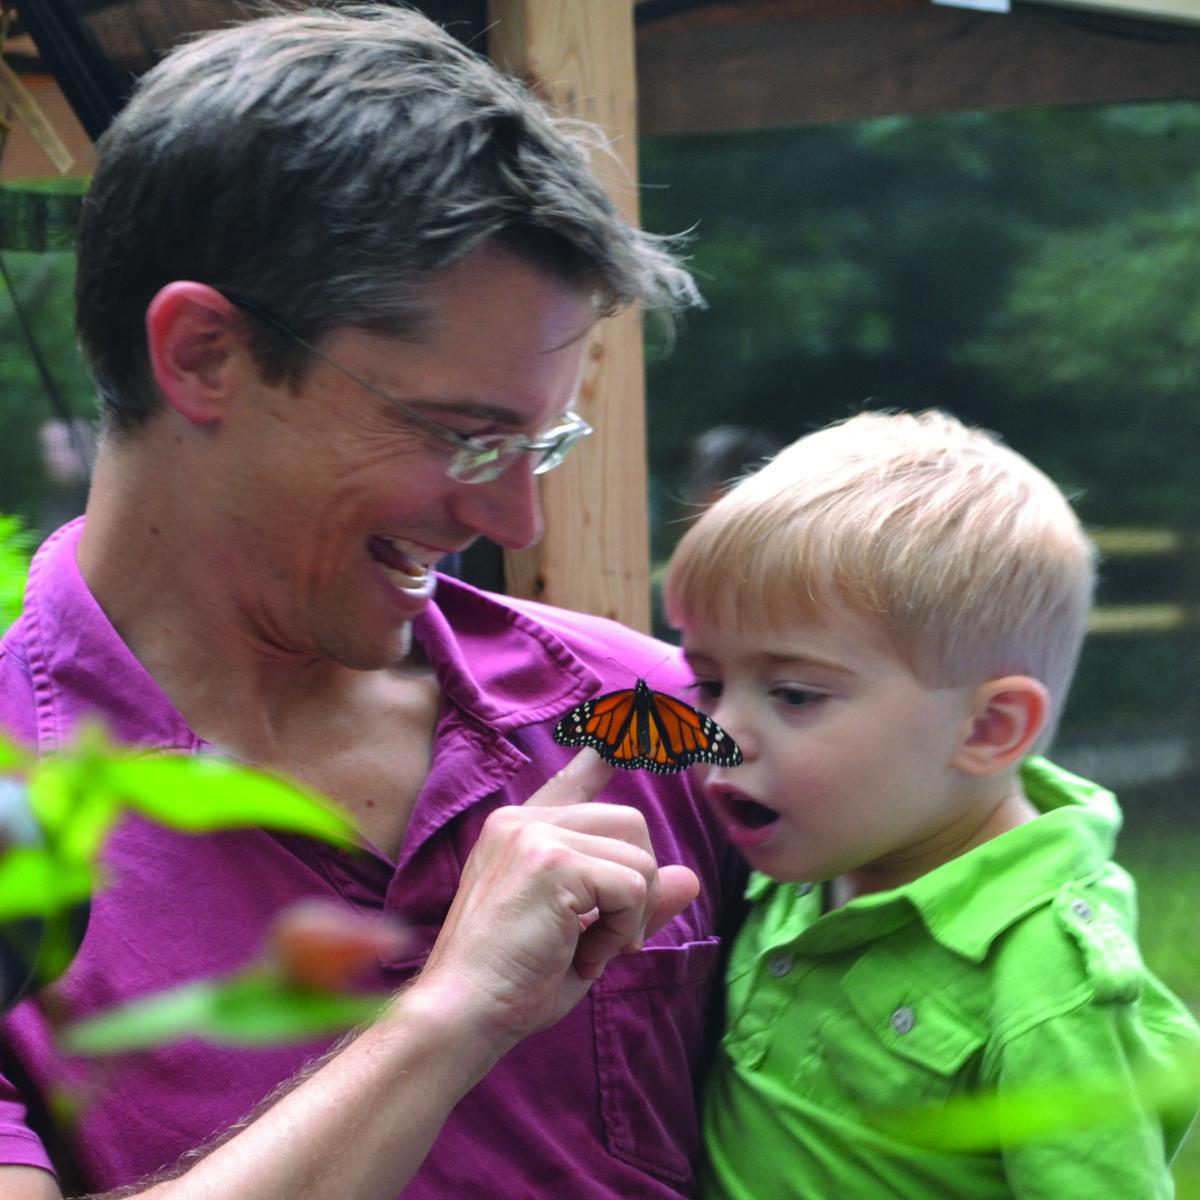 The Butterfly Encounter WalkThrough Exhibit in Roswell